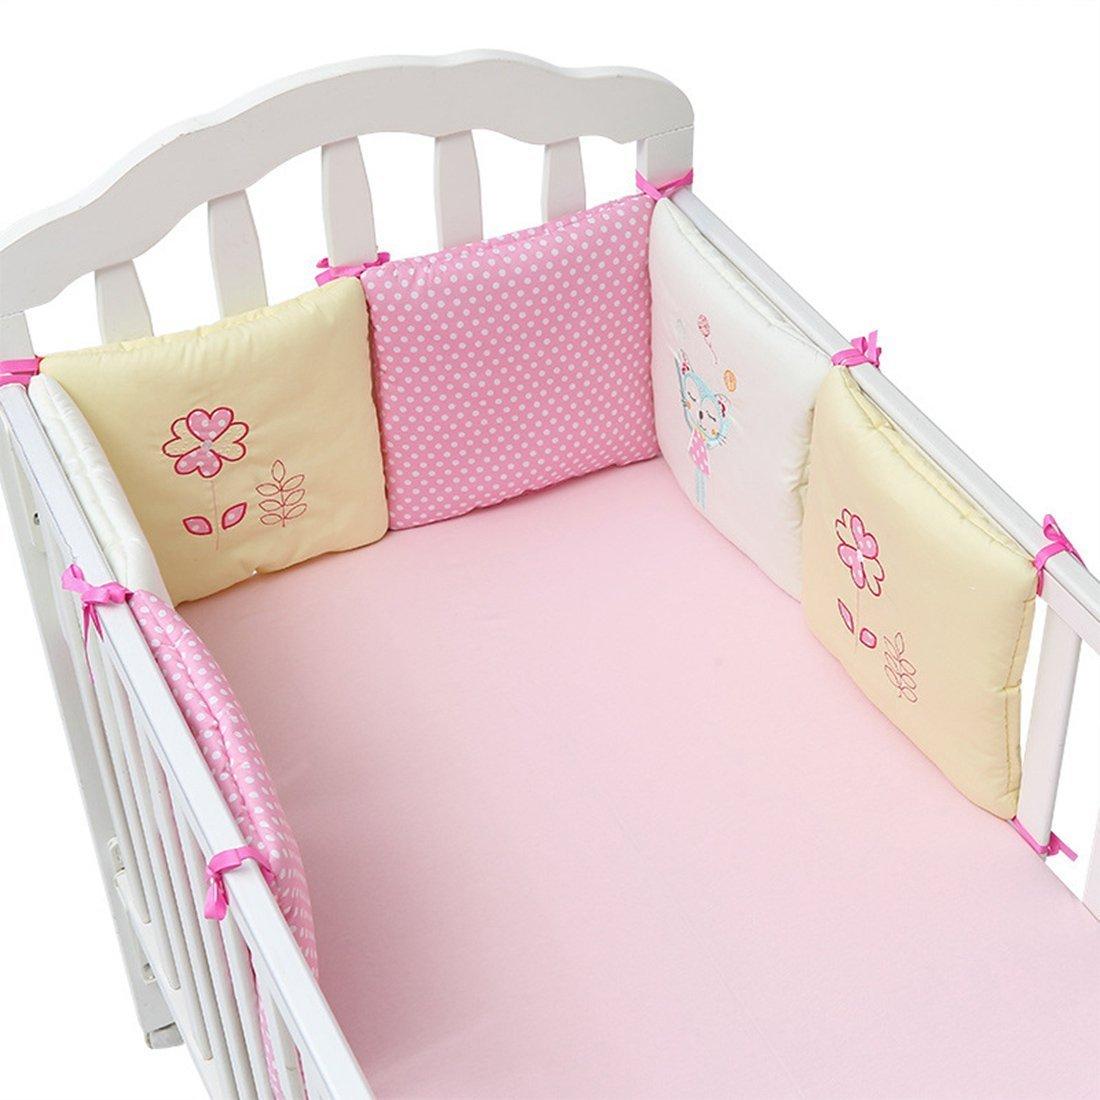 6pcs Infant Crib Bumper Bed Protector Baby Kids Bedding Nursery Bumper Cotton Crib Bumper (flower) Sunveno